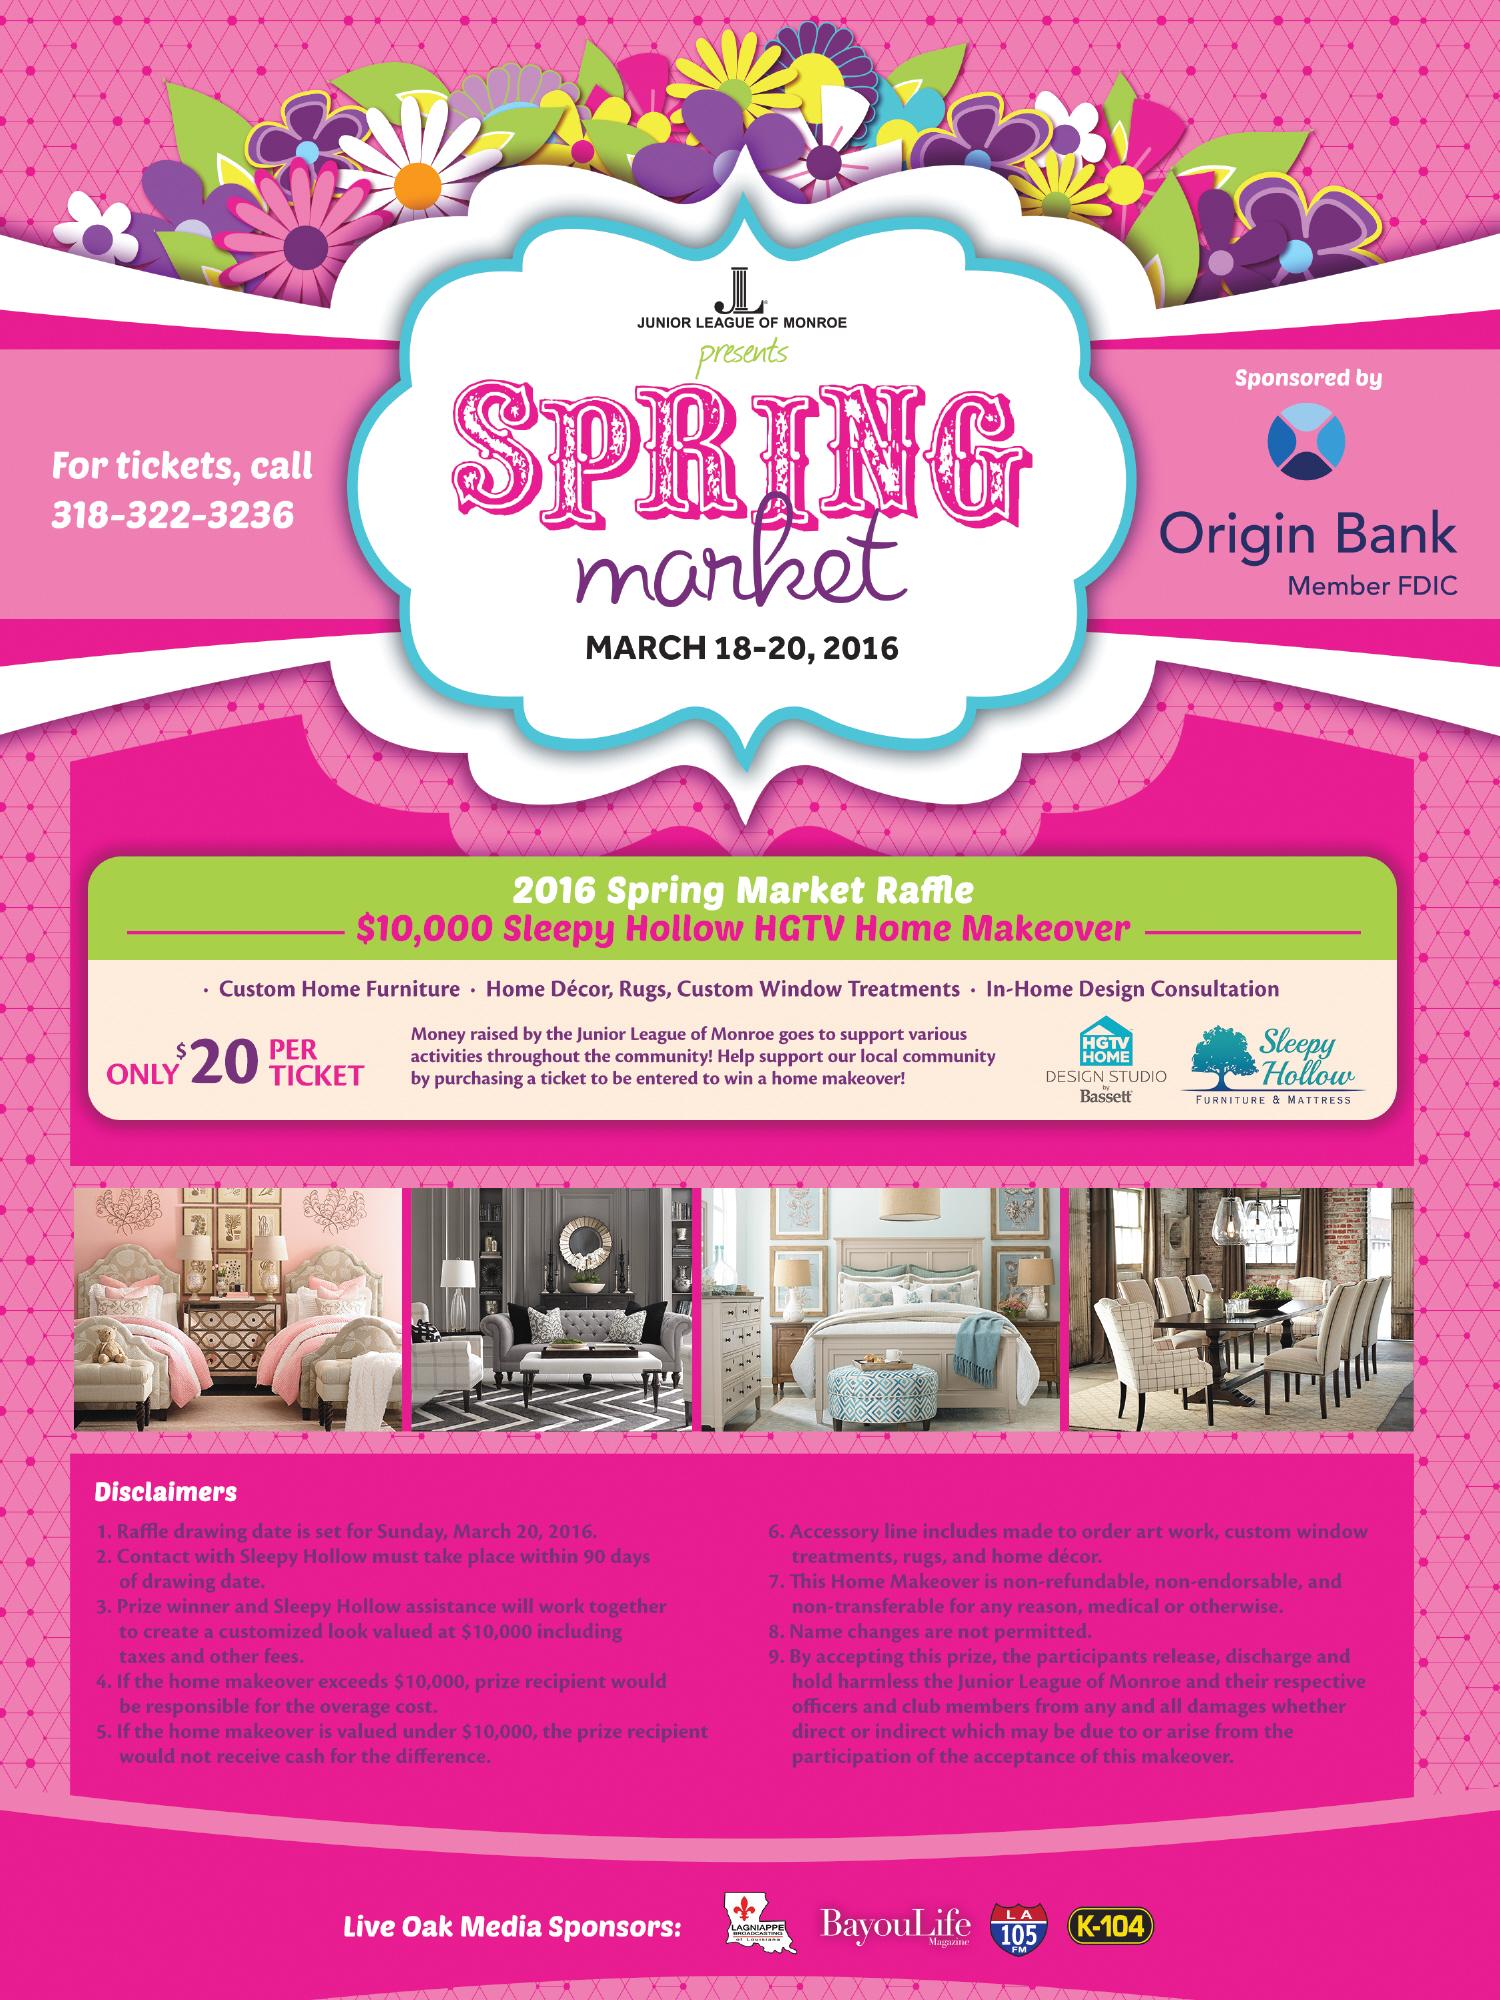 SpringMarketRaffle